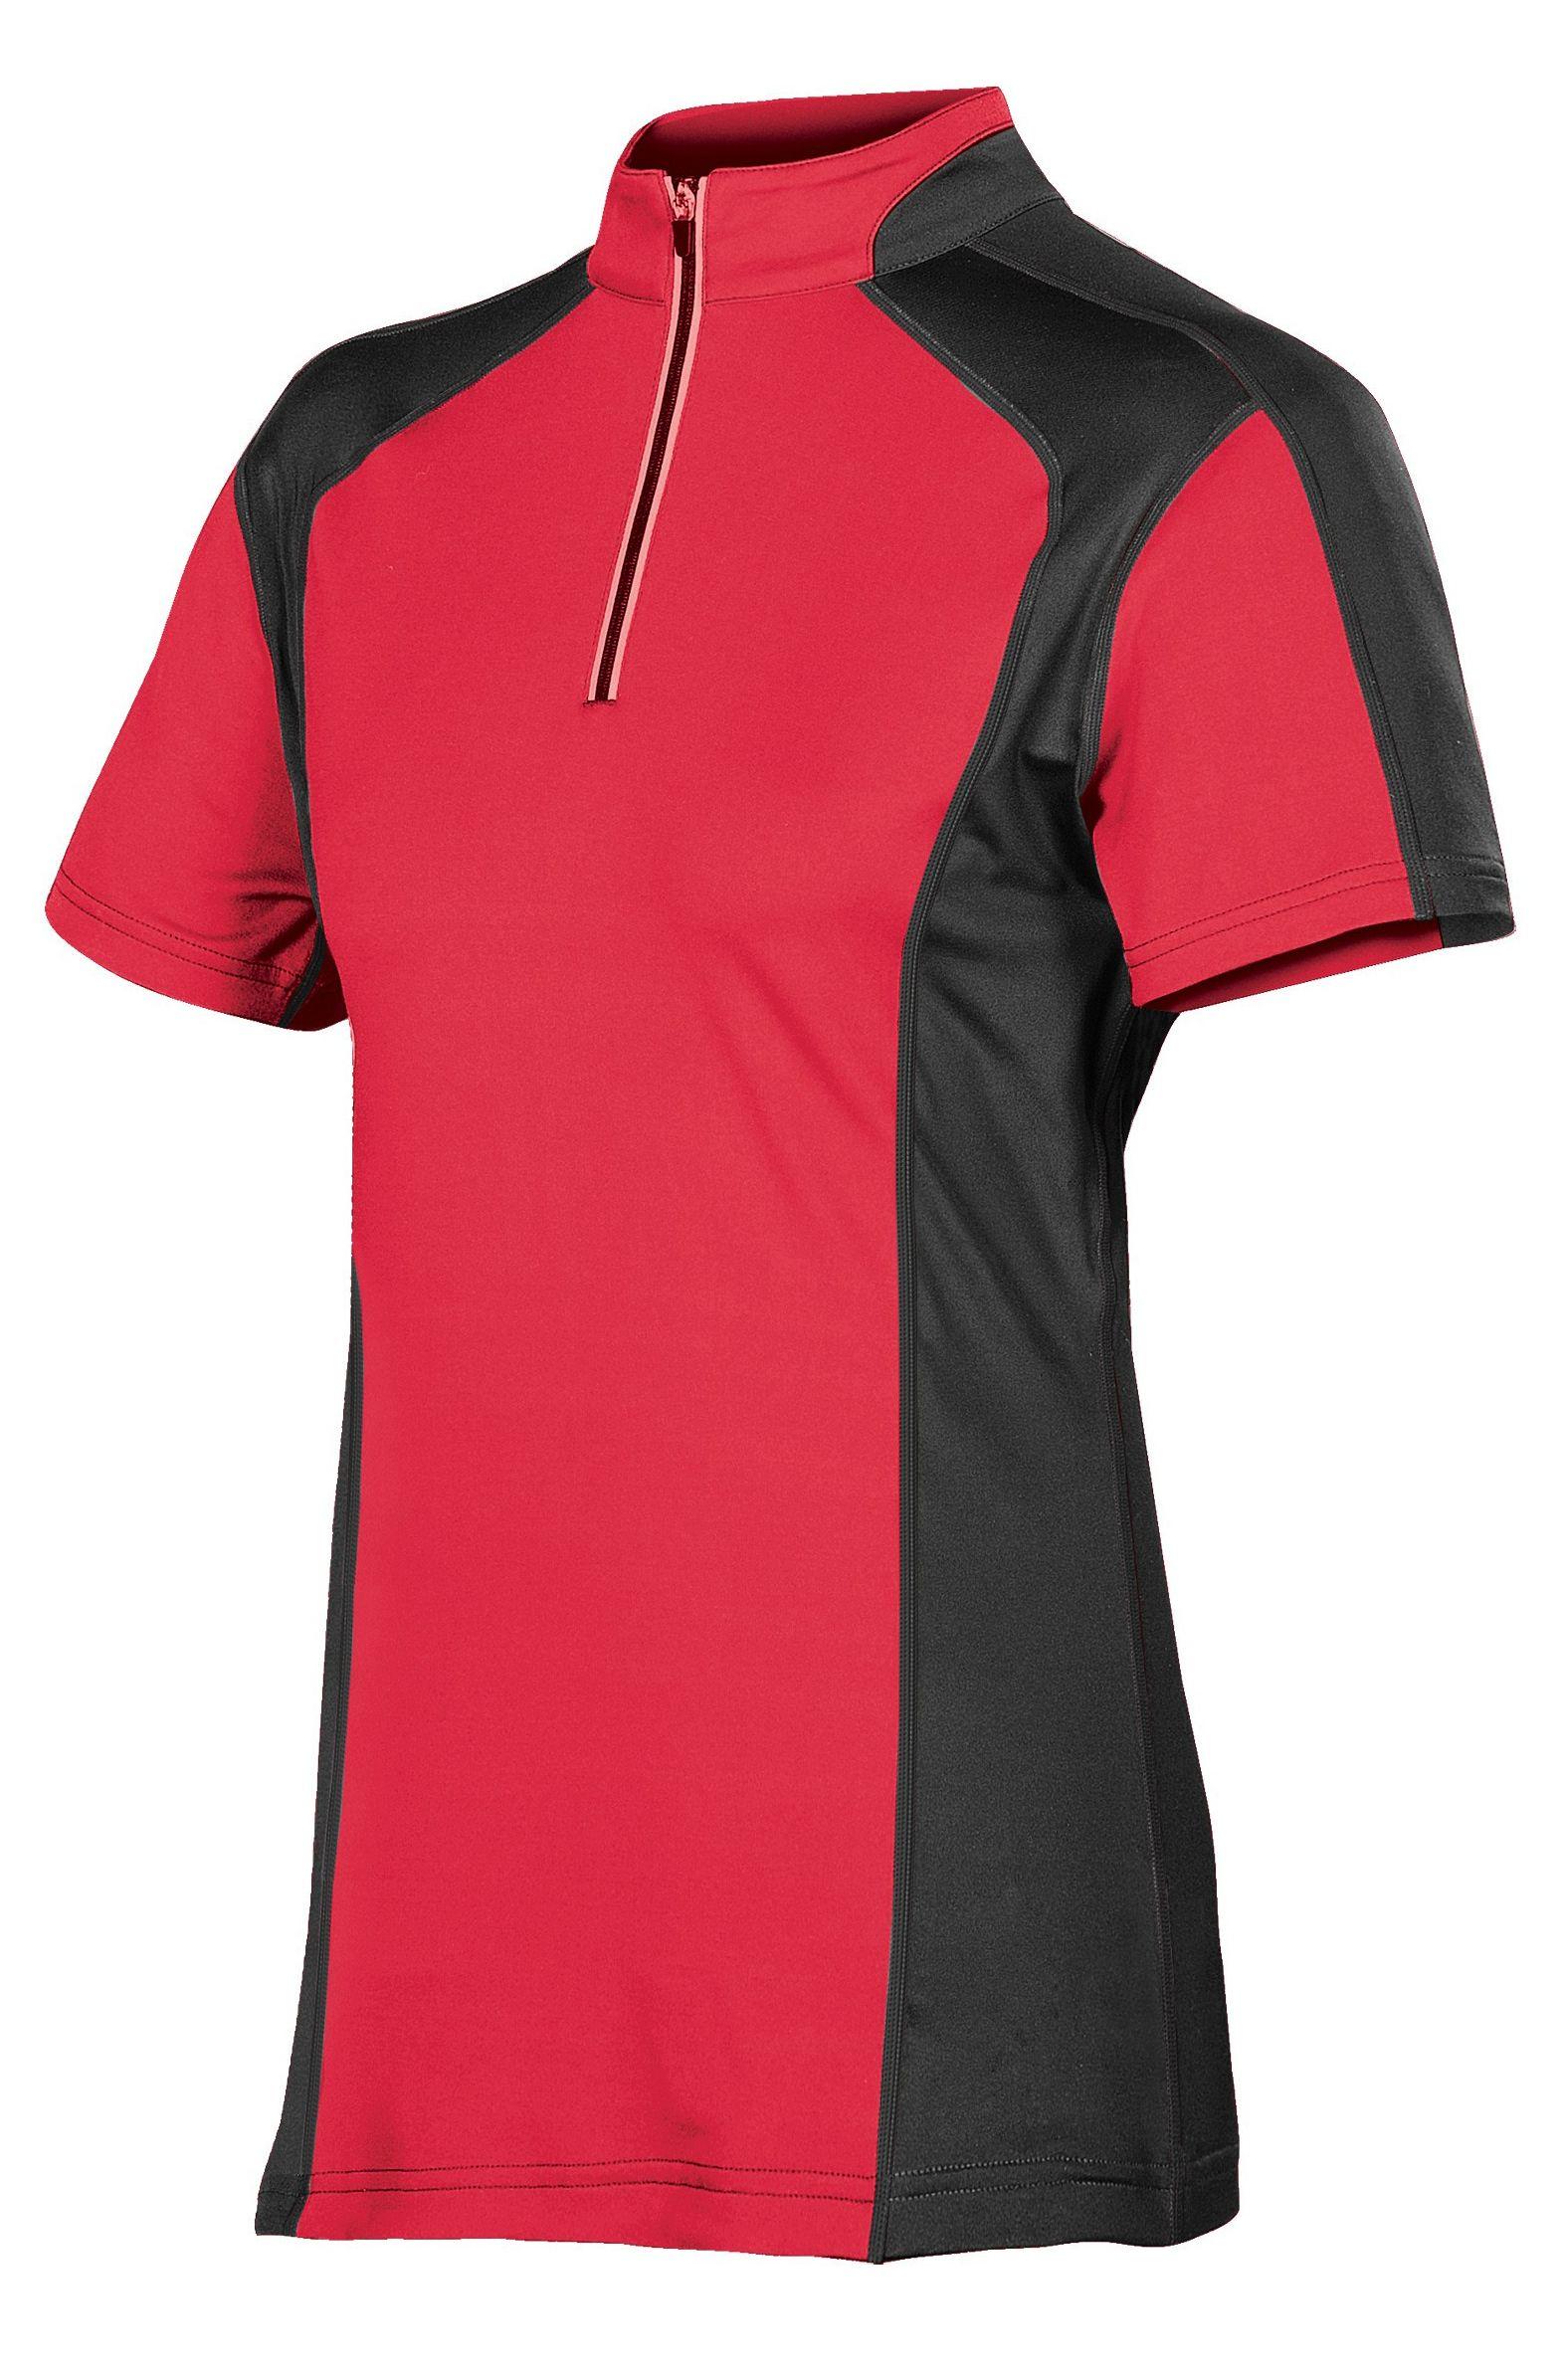 2 Tone Mandarin Collar Half Zipper T Shirt For Corporates